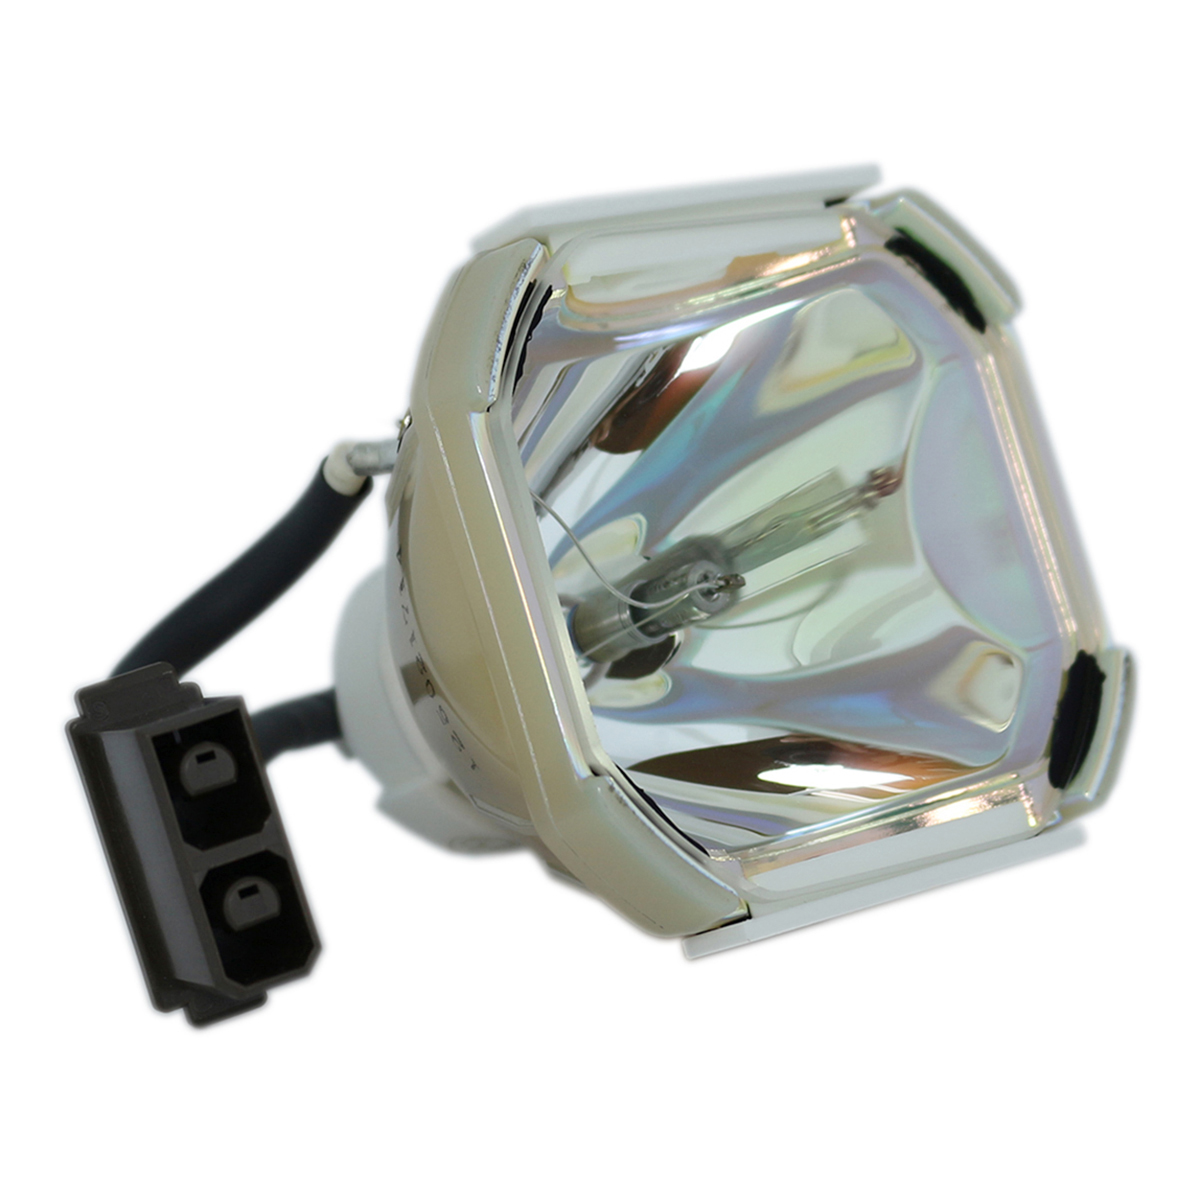 все цены на Compatible VLT-X300LP VLTX300LP for Mitsubishi X300 X300U S290U S290 X290 X250 S250 S250U Projector Lamp Bulb without housing онлайн